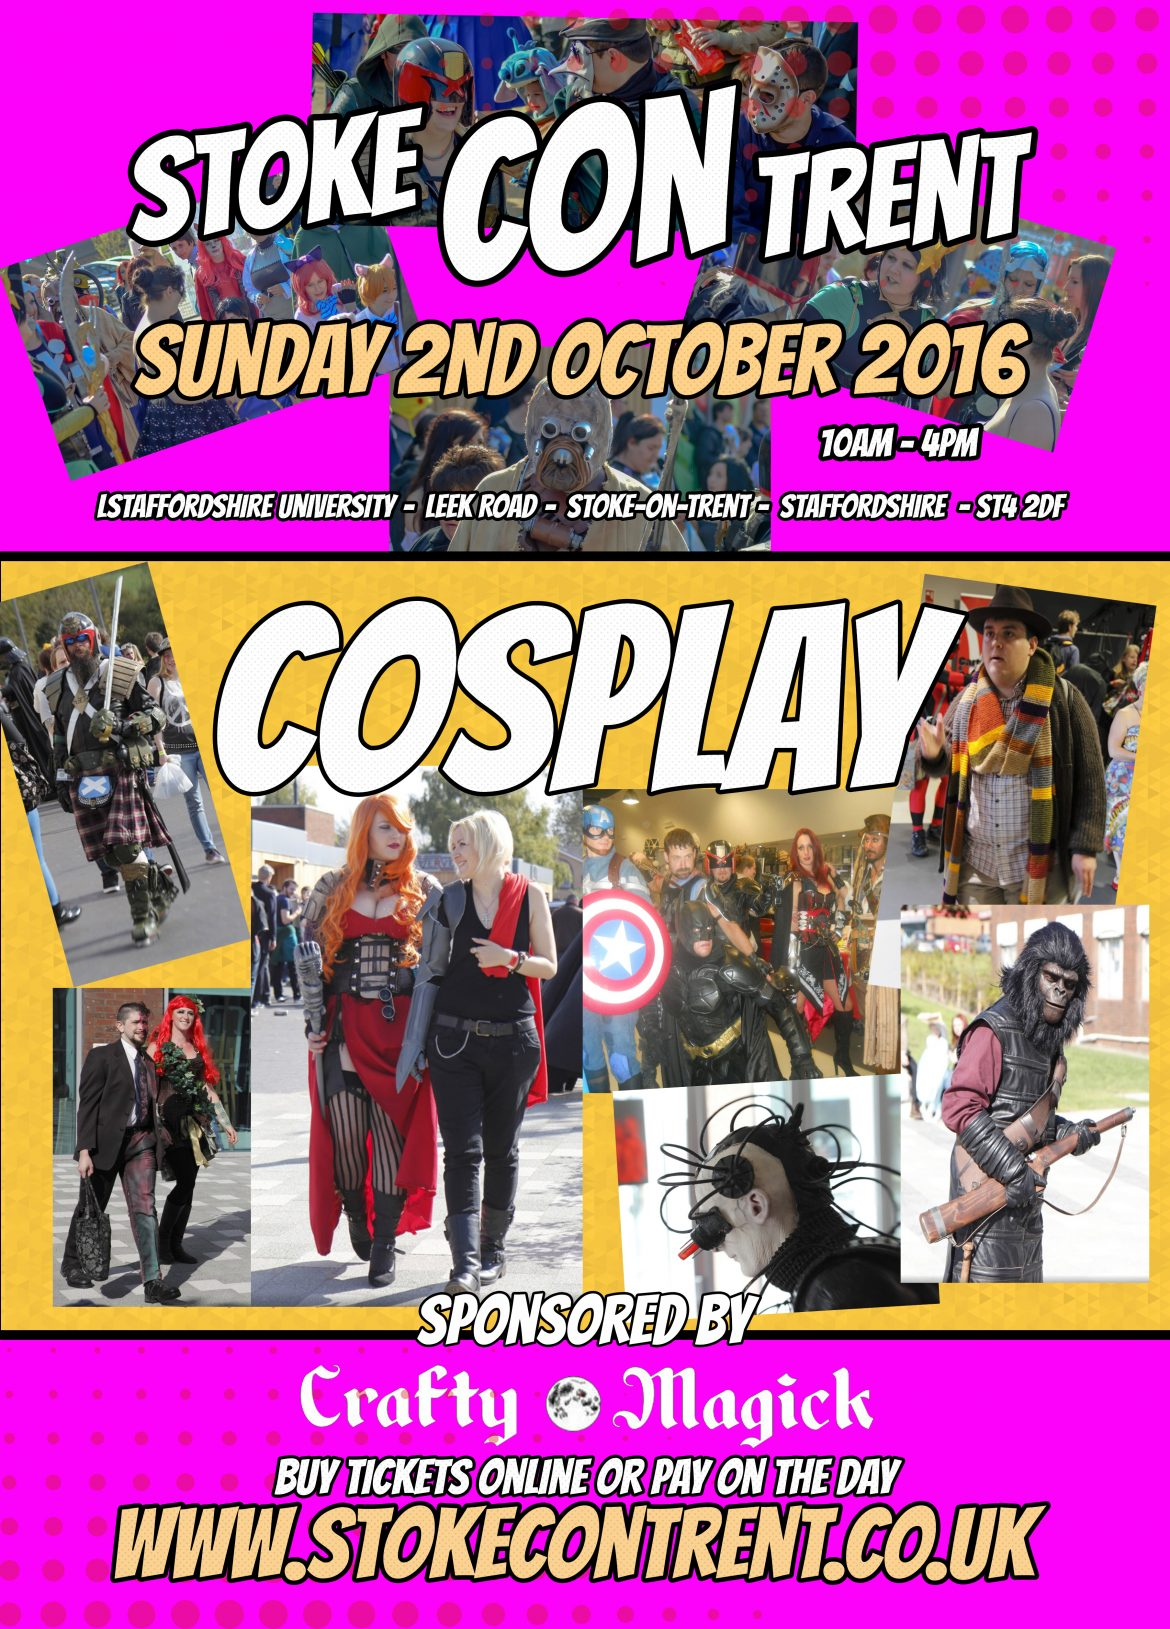 crafty magick cosplay cosplay-stoke-con-trent-5